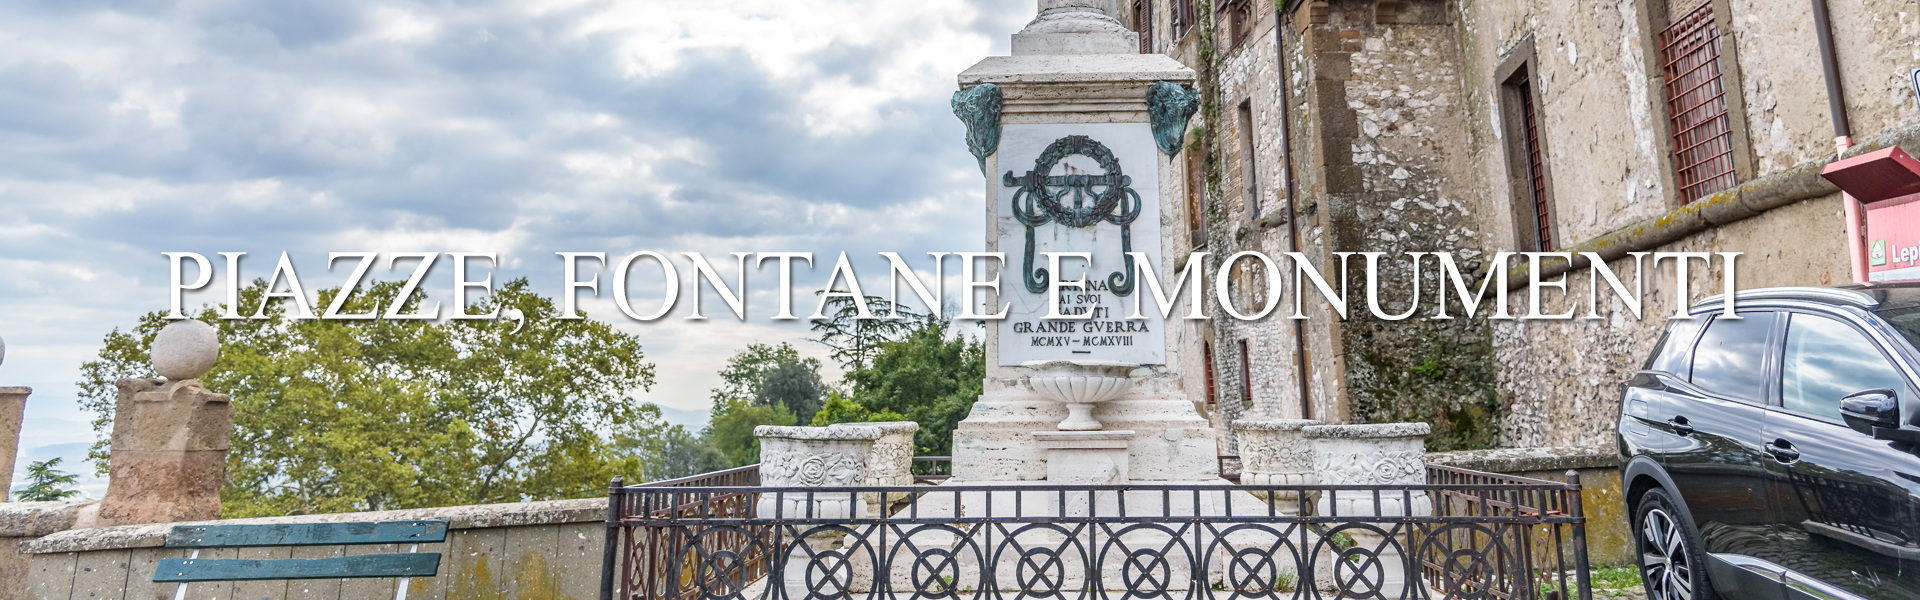 piazze-fontane-monumenti-1920x600